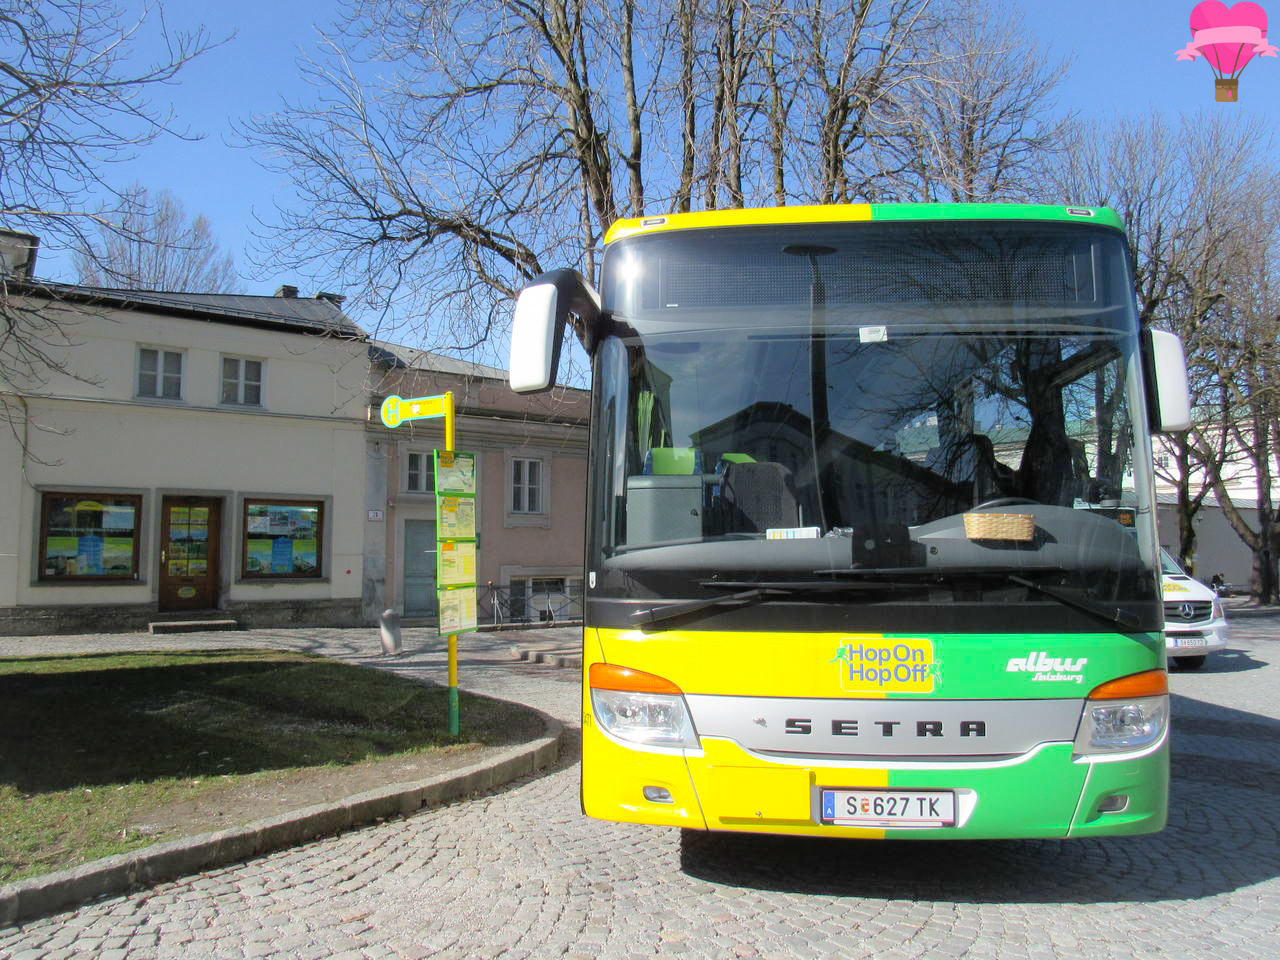 onibus-hop-on-hop-off-salzburg-sightseeing-tours